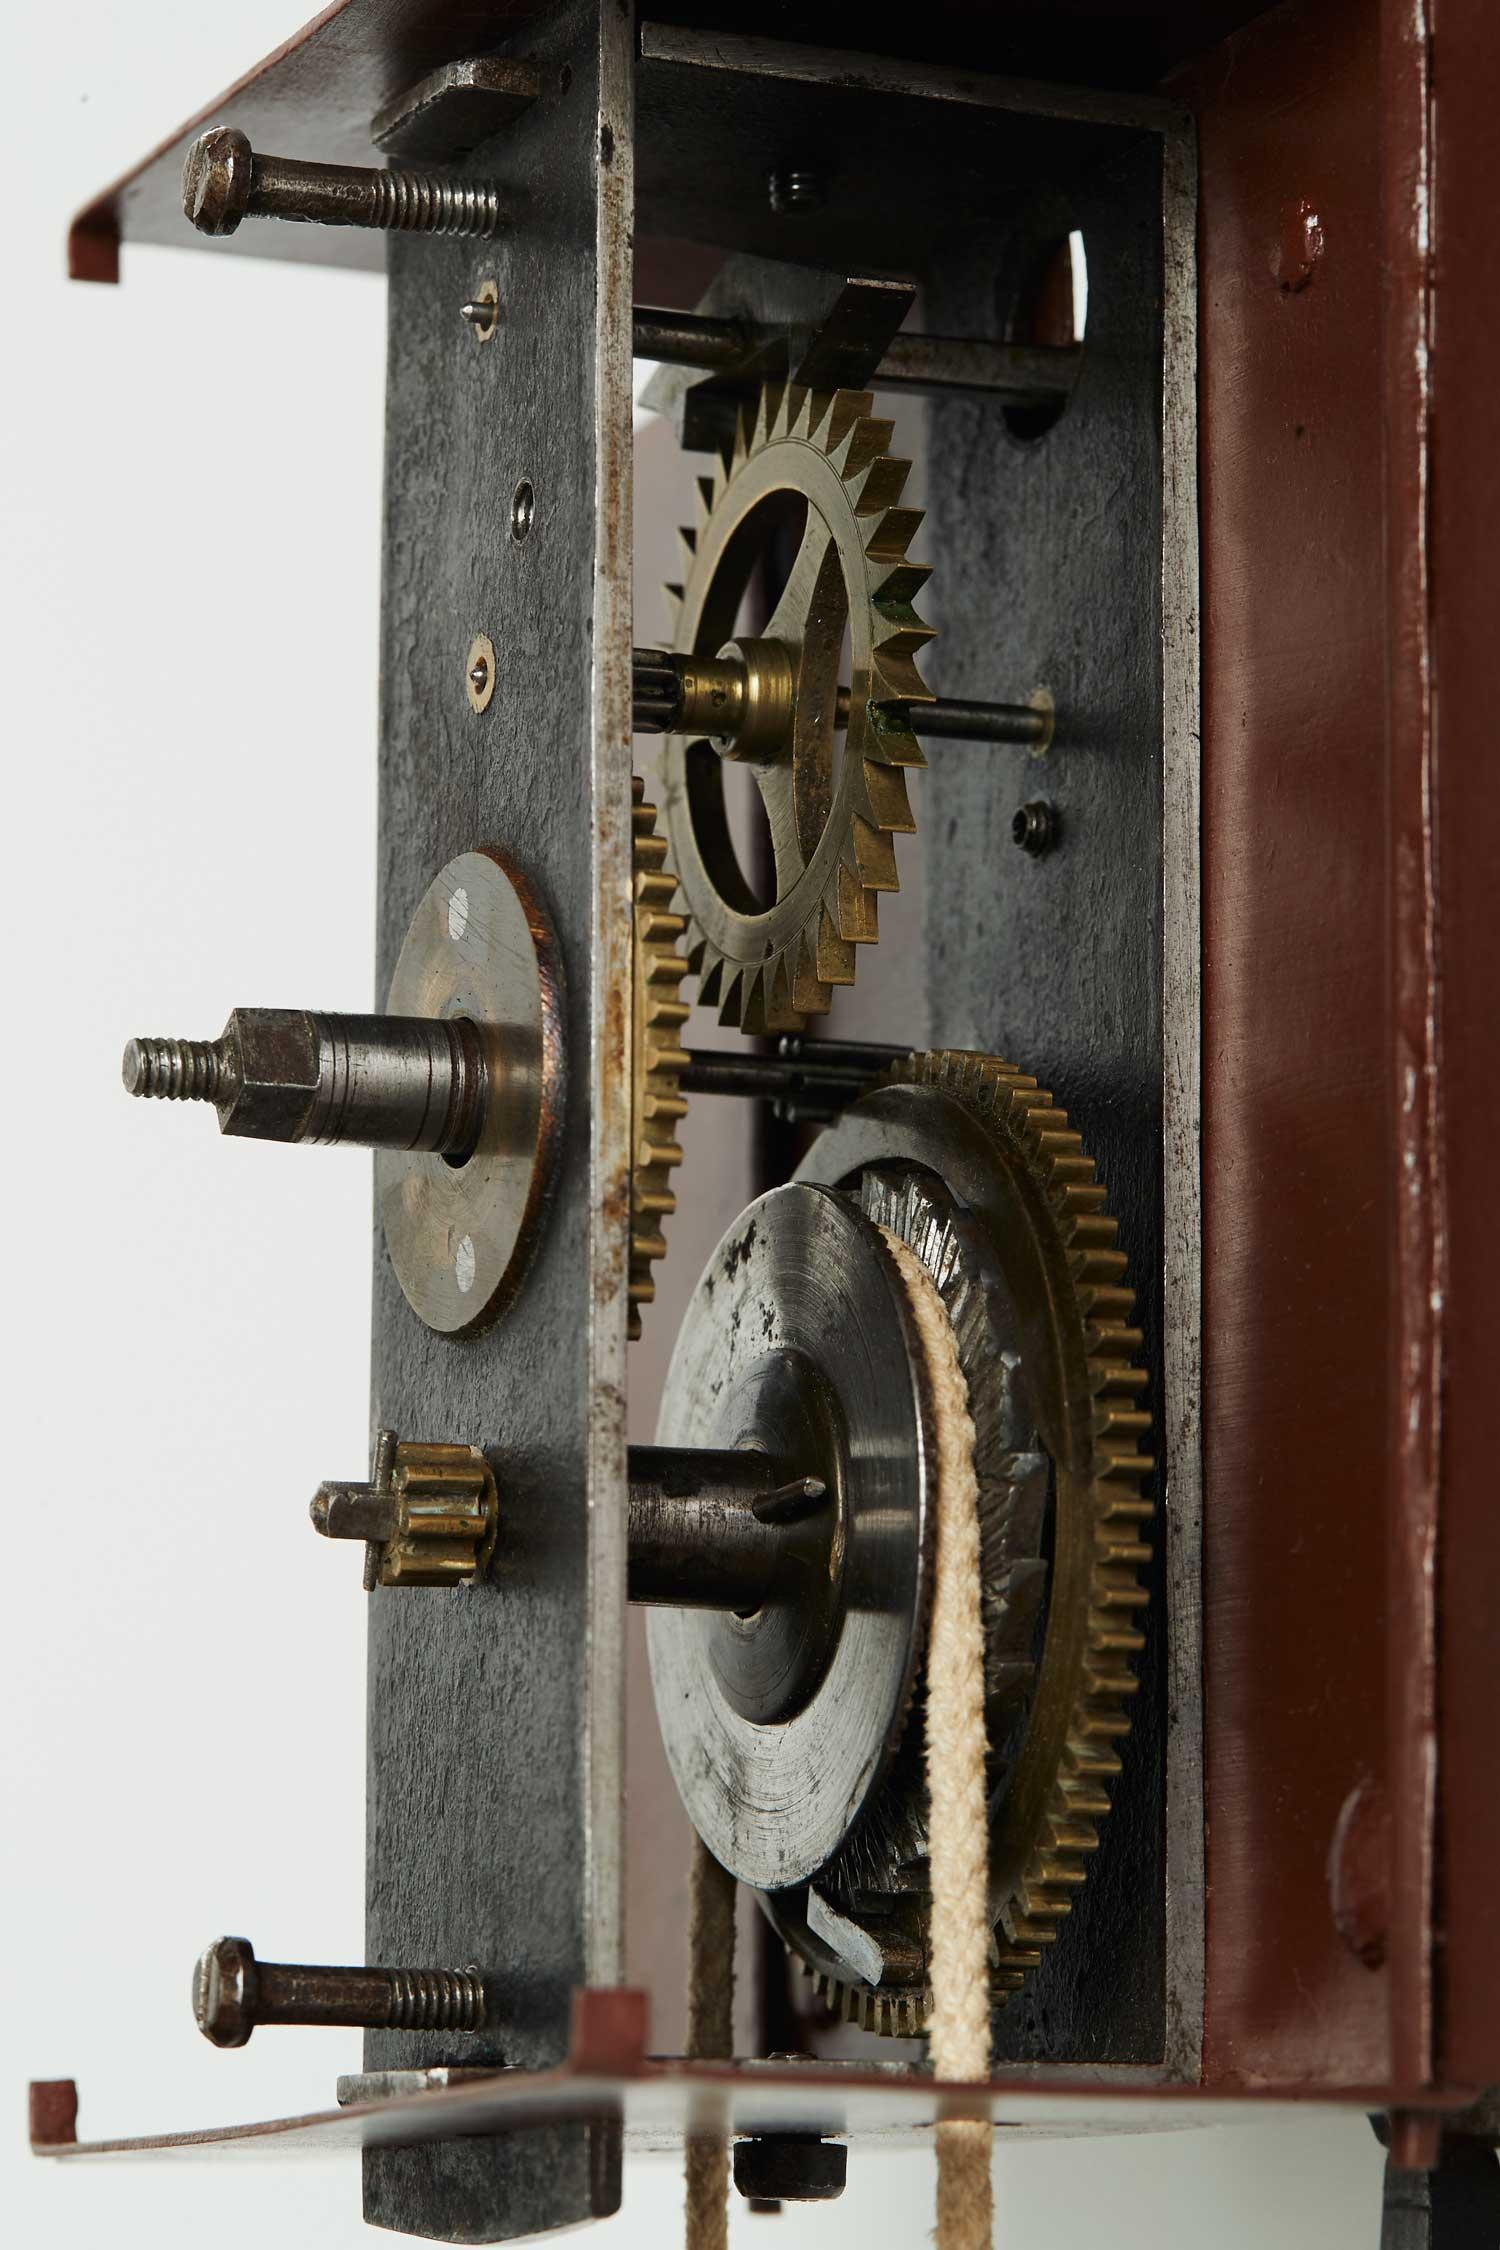 mandtler-clock-1870-mennonite-mc0220-1.jpg